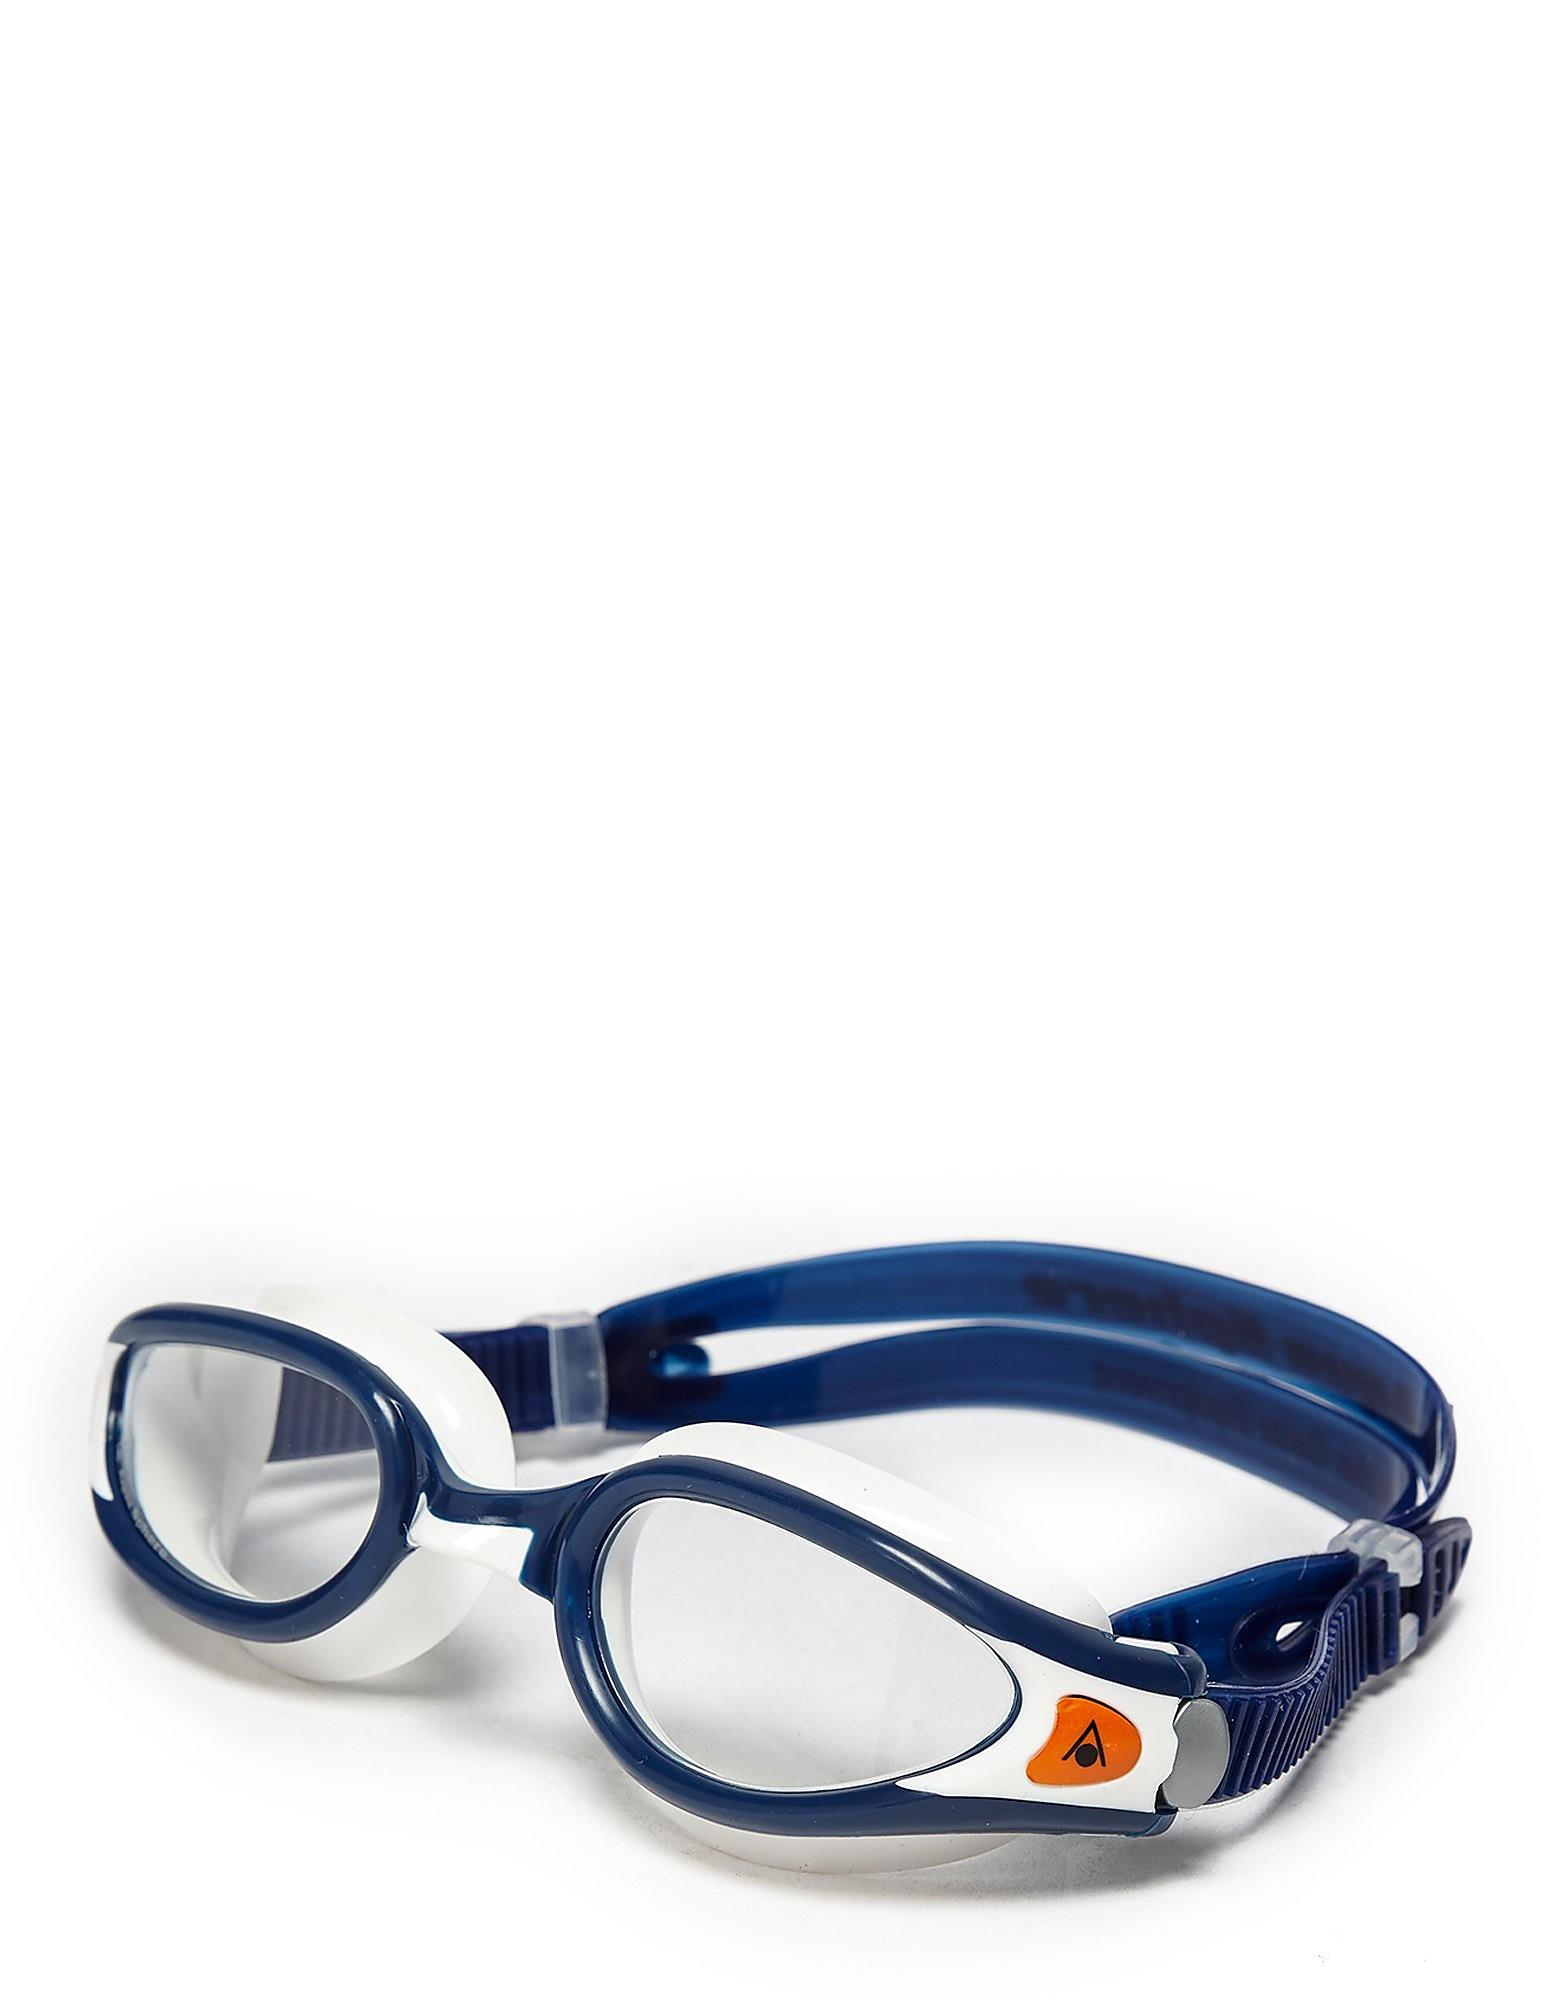 Aqua Sphere Kaiman Exo Goggles Clear Lens